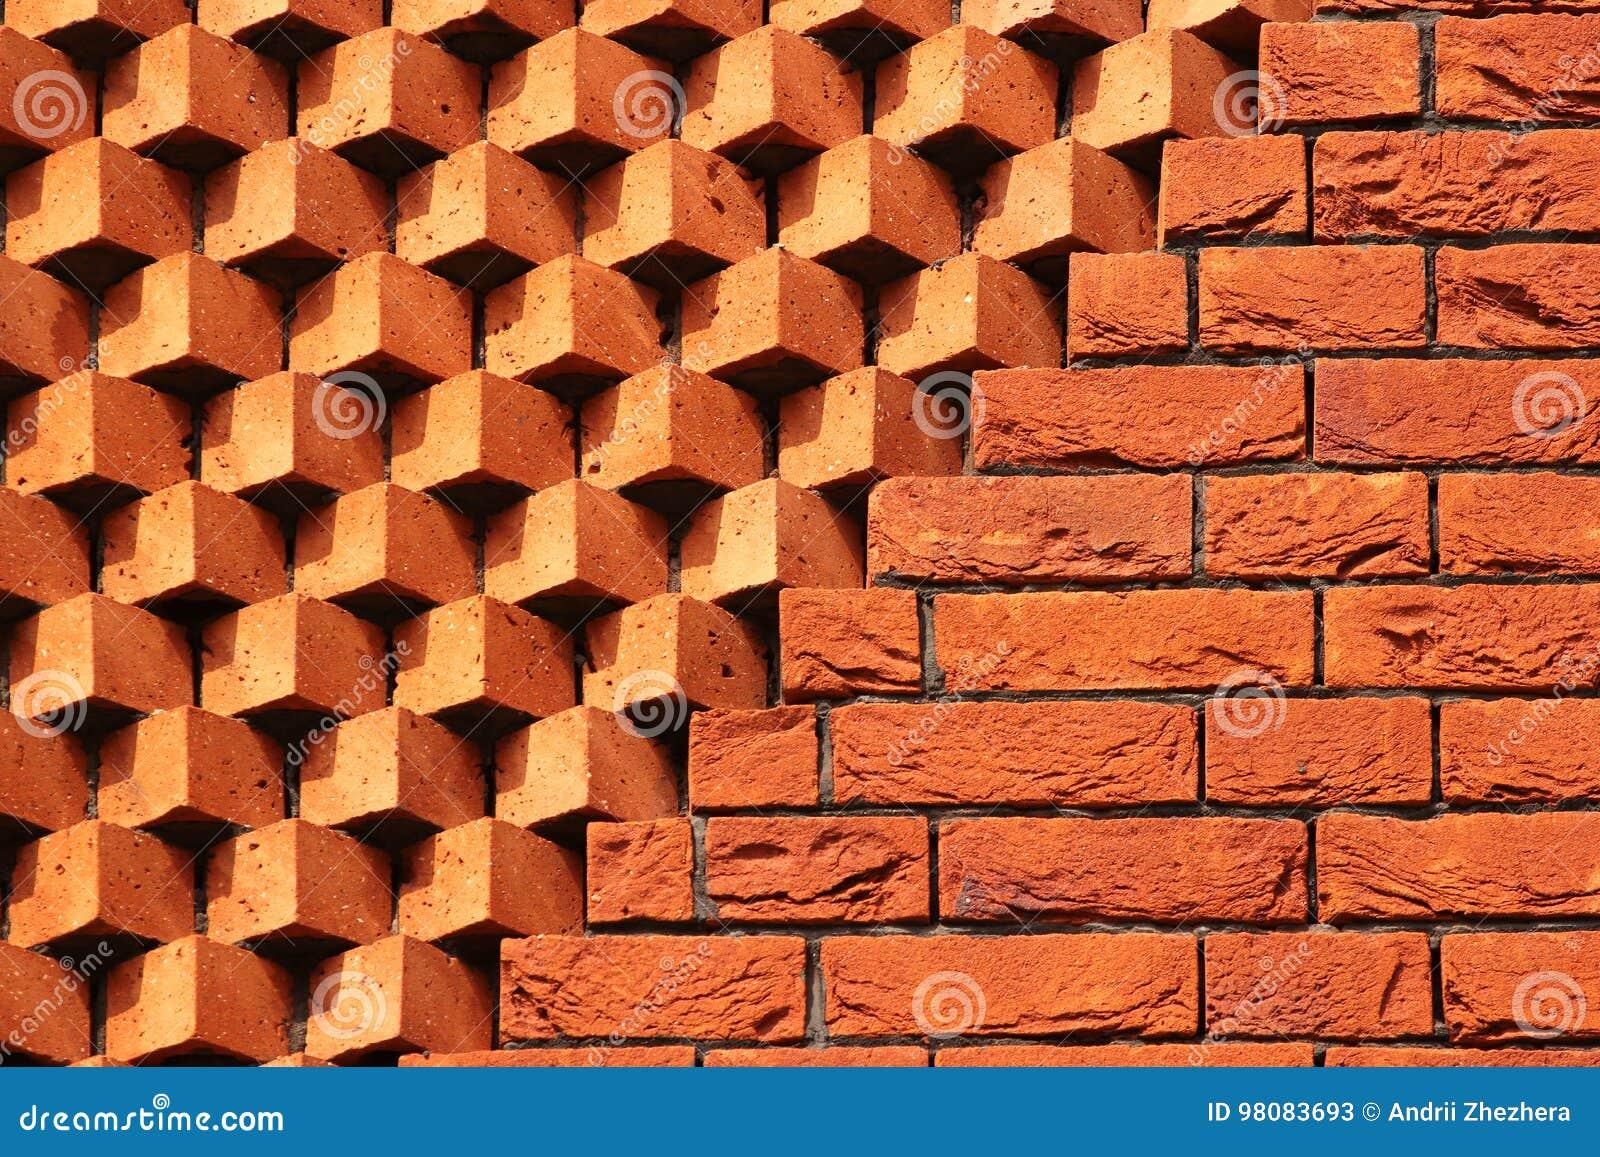 Sawtooth pattern brickwork. Decorative red brick wall as background